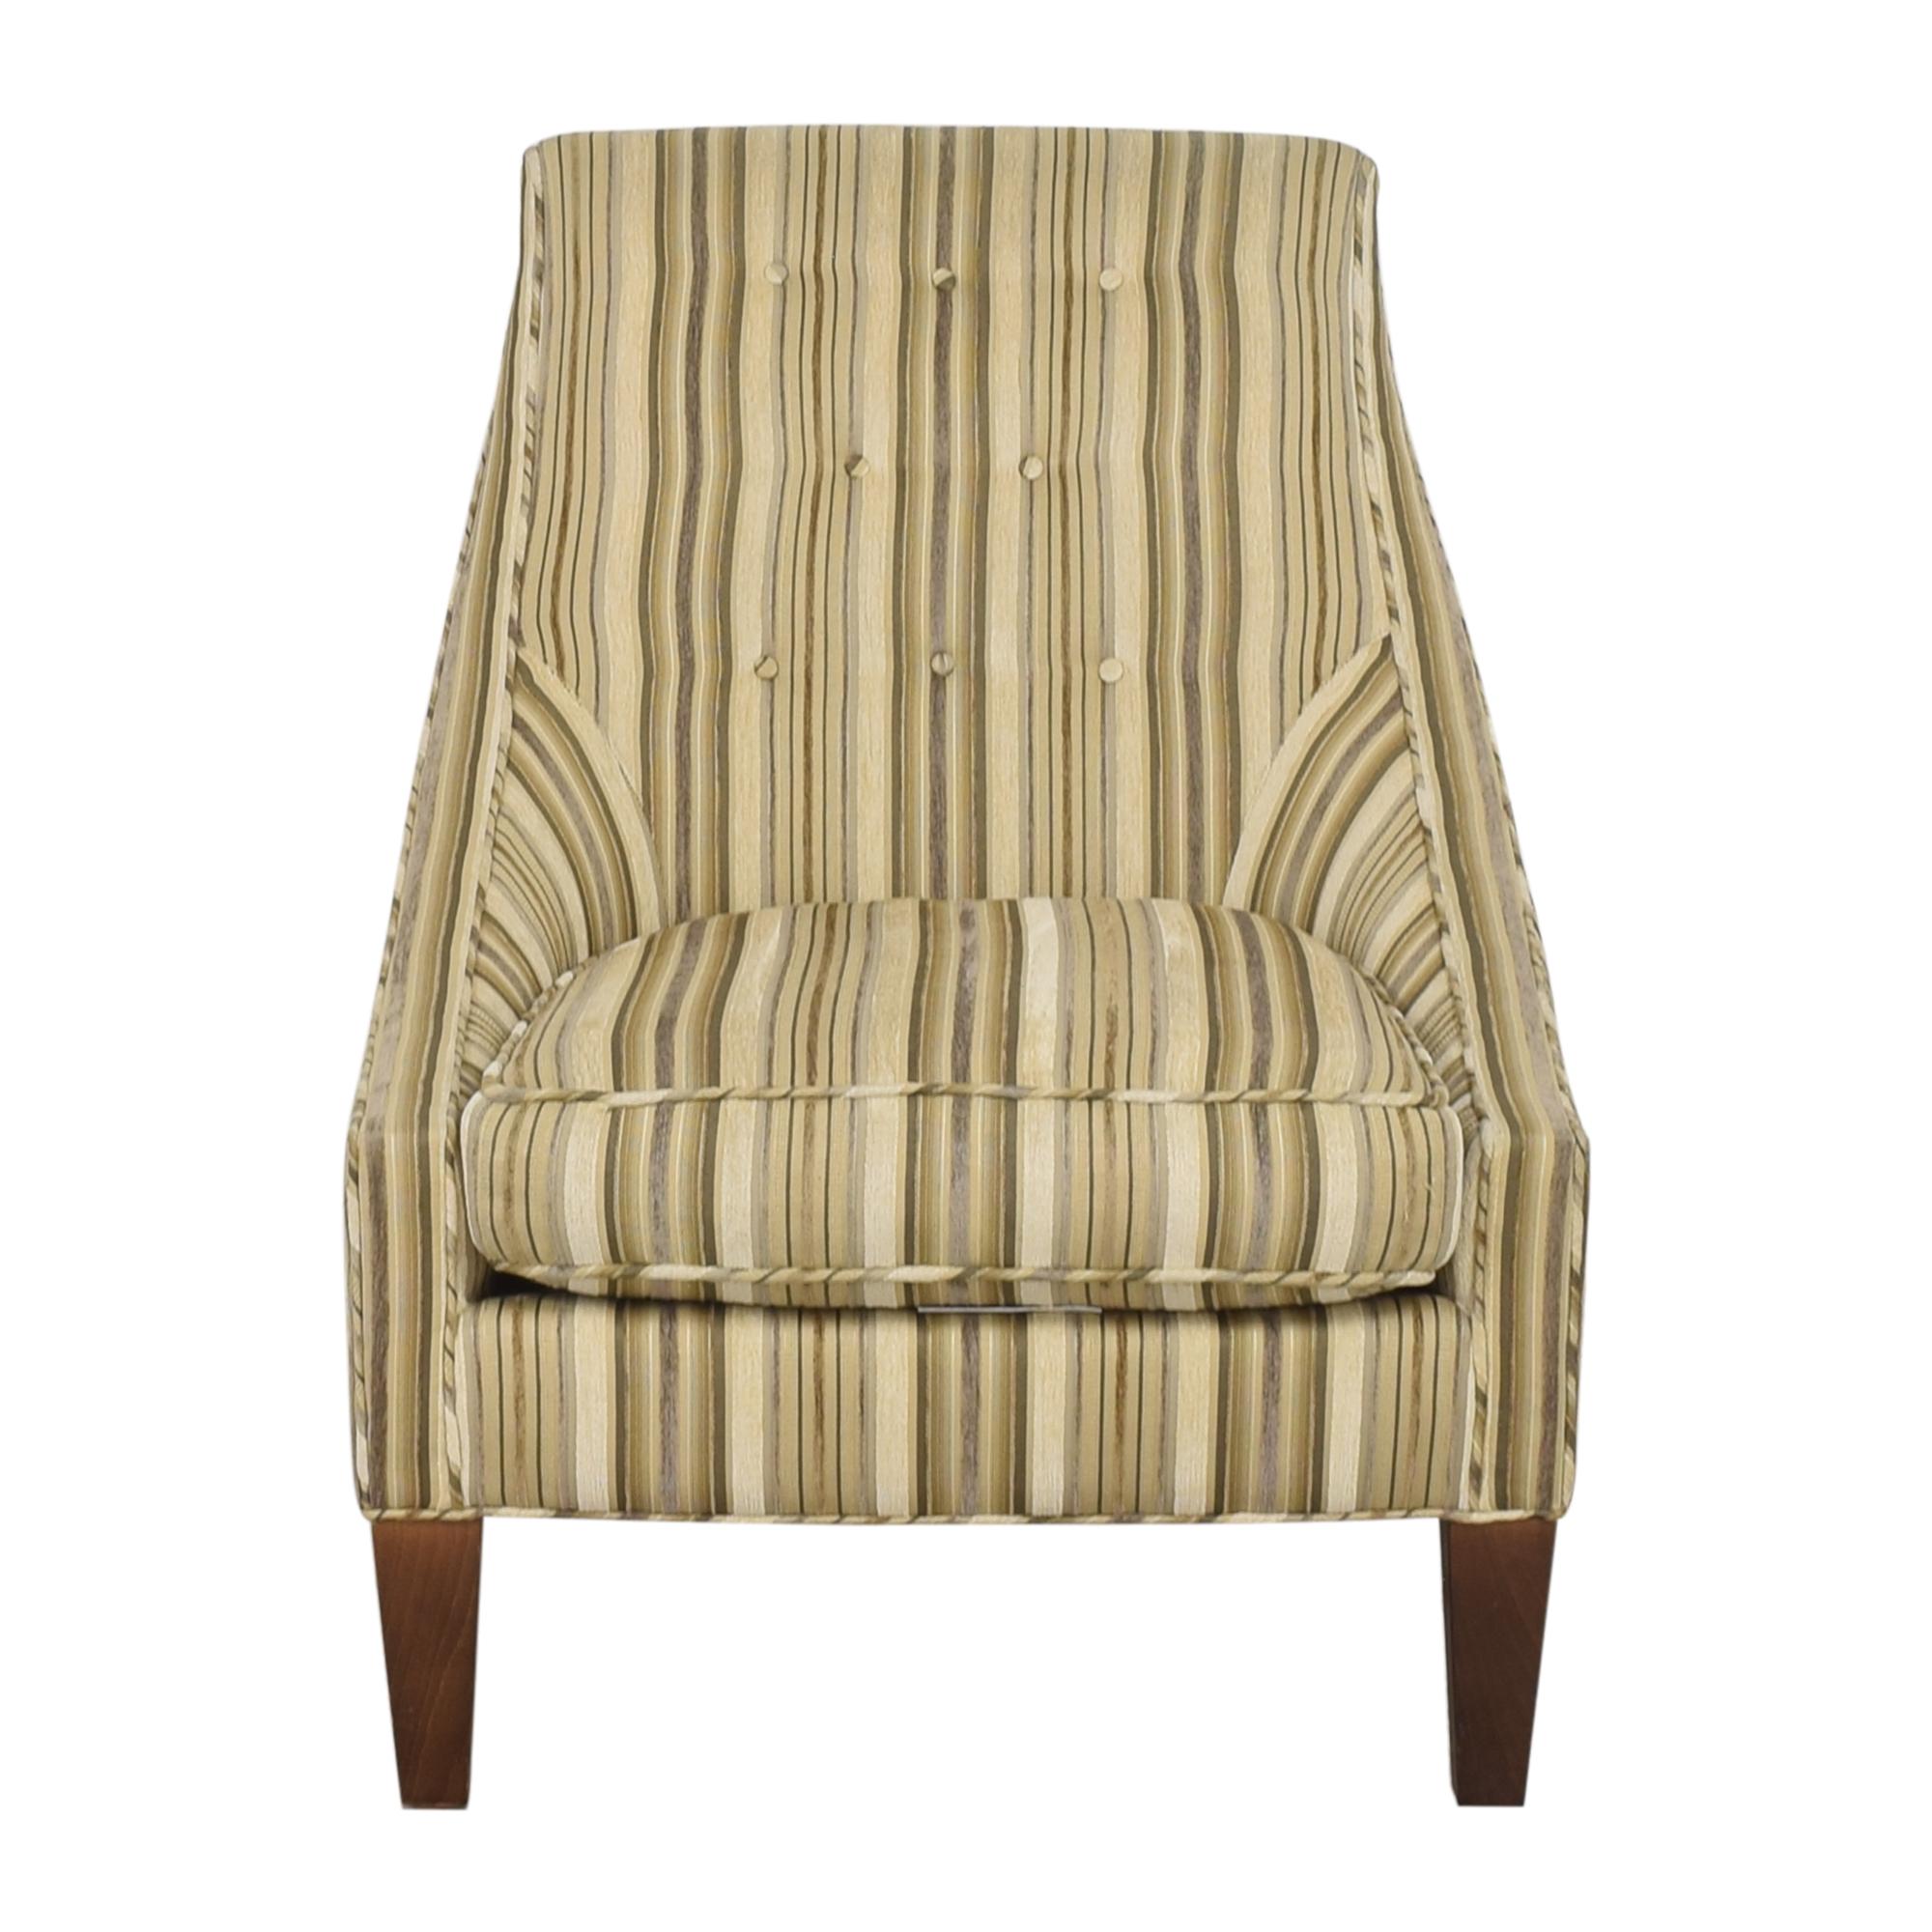 shop Lillian August Lillian August Accent Chair online